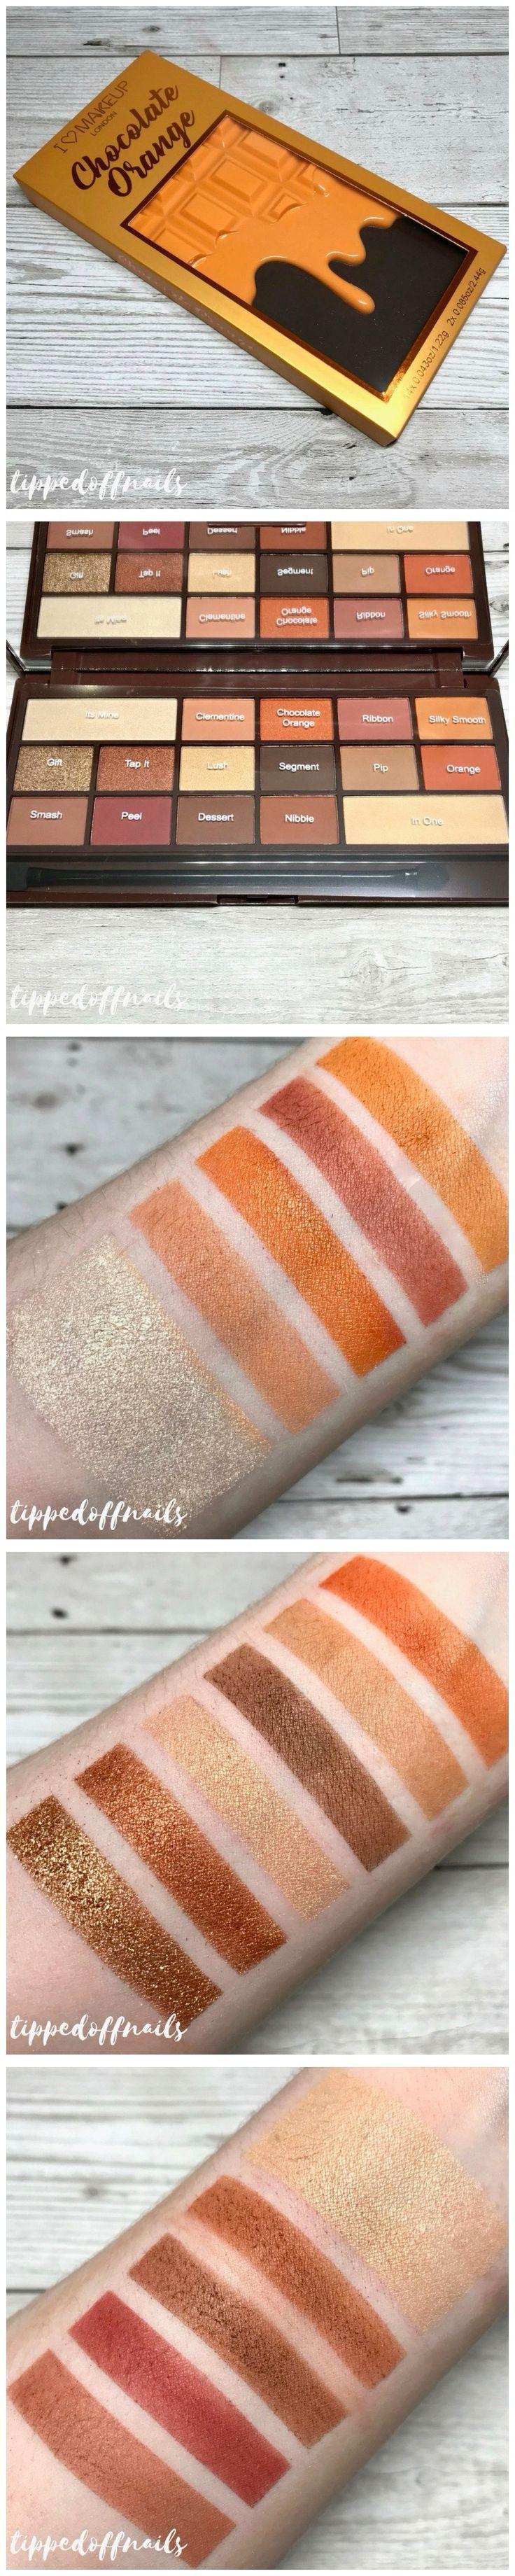 I Heart Makeup (Tam Beauty) Chocolate Orange palette